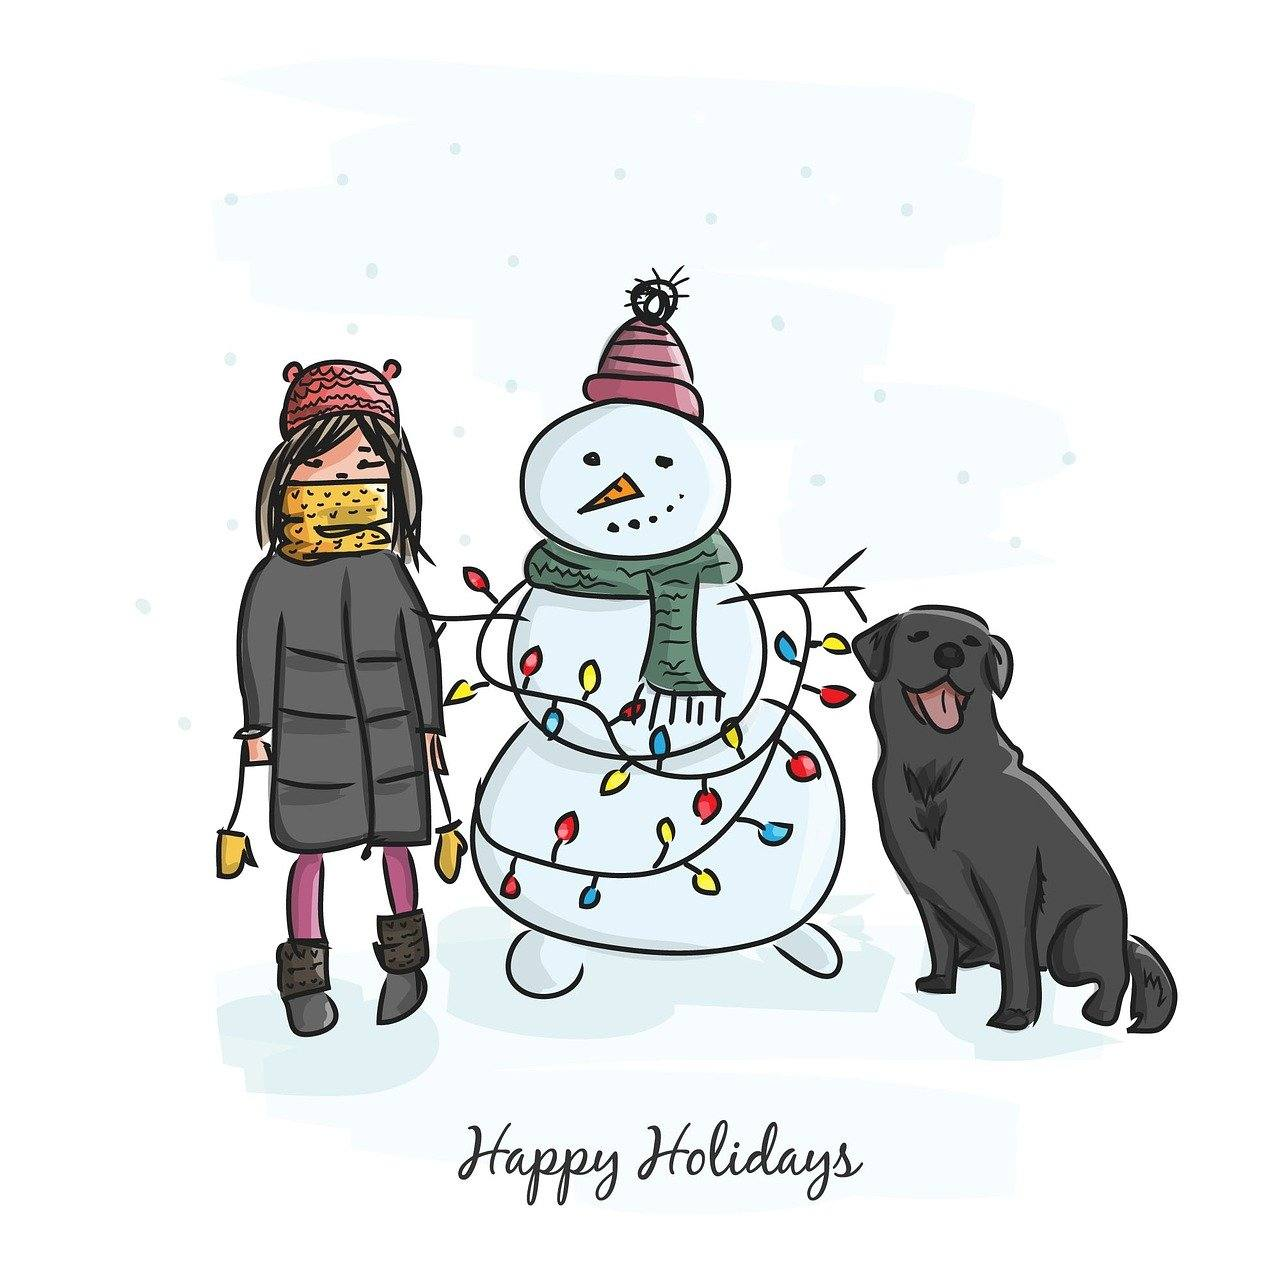 Snowman sober holiday season